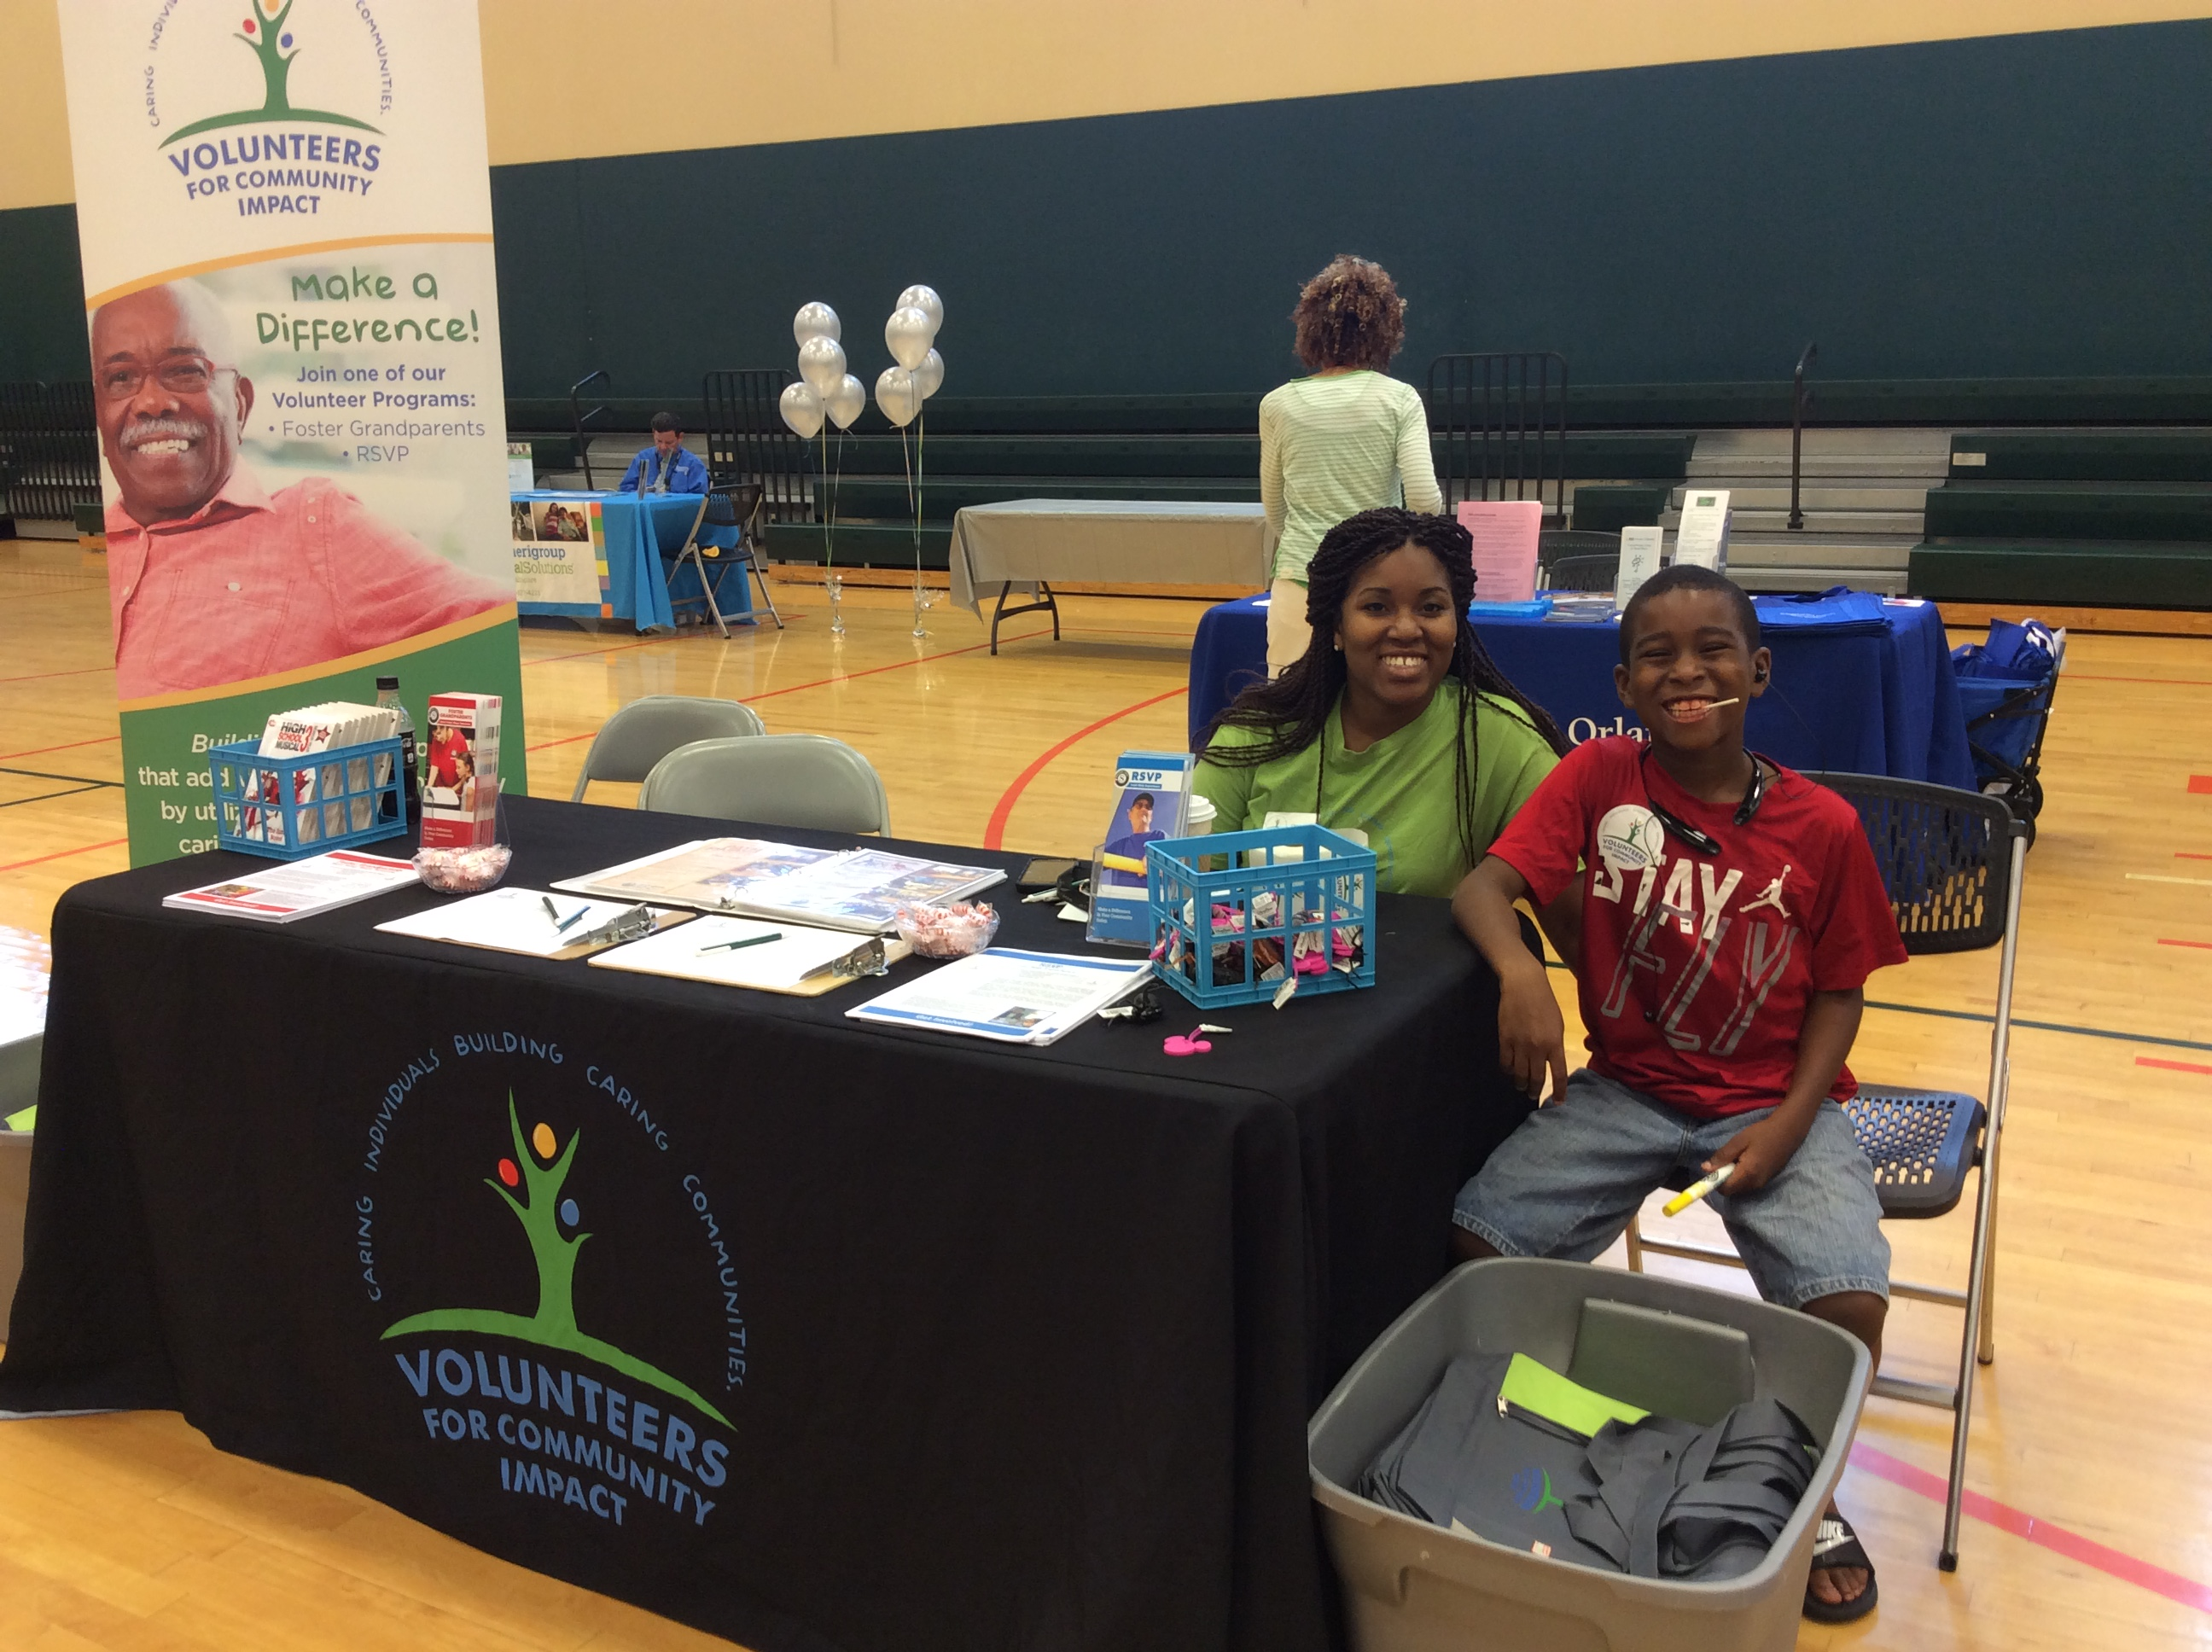 Volunteers for Community Impact